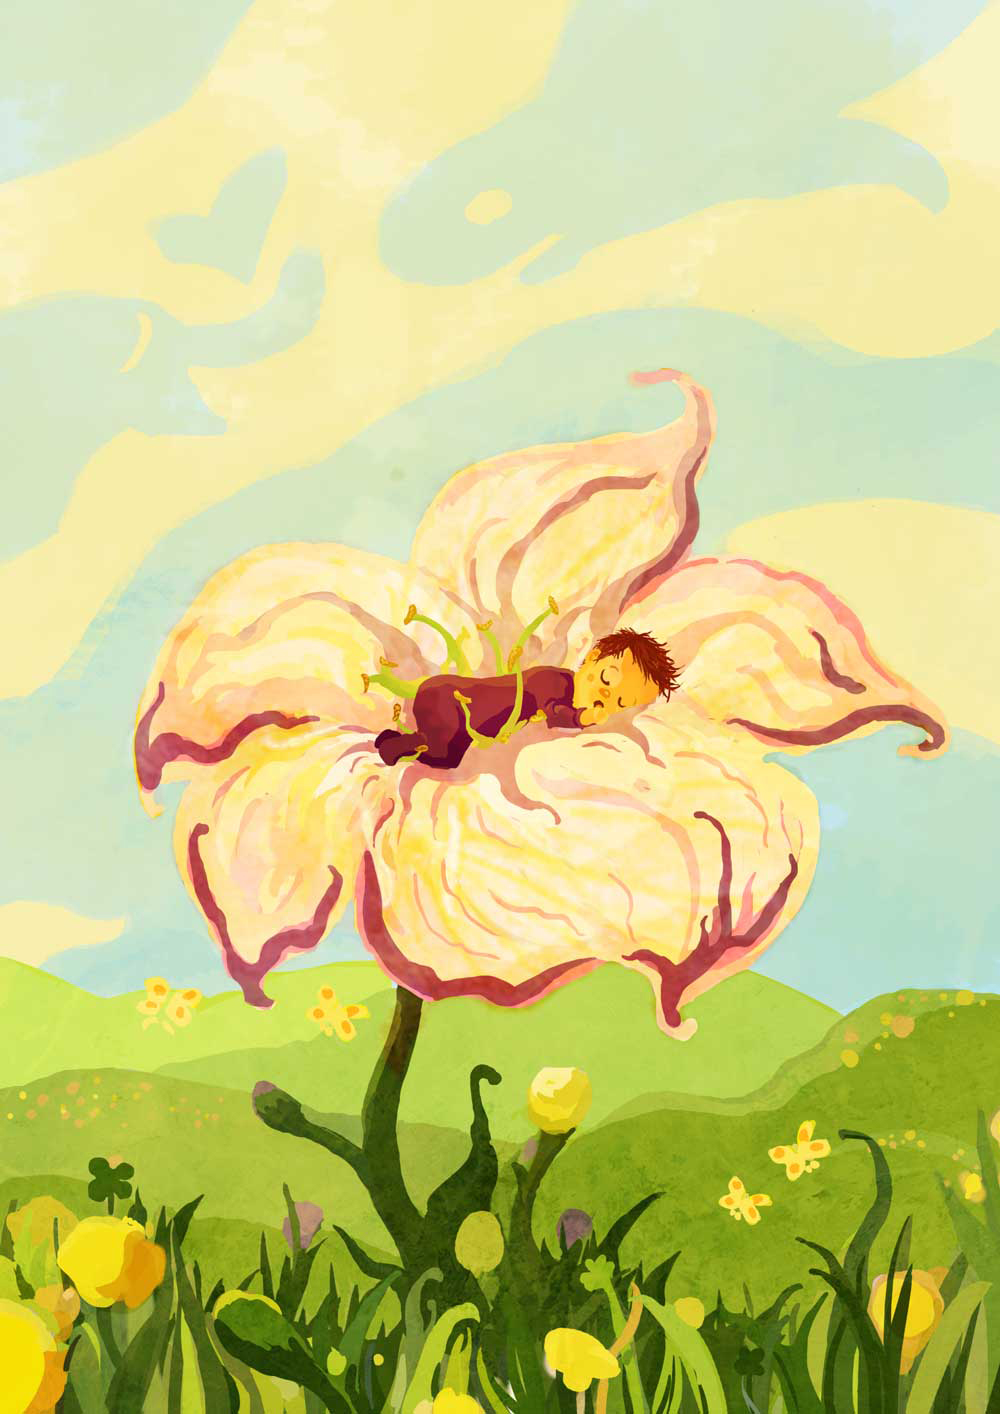 sleeping lilly illustration